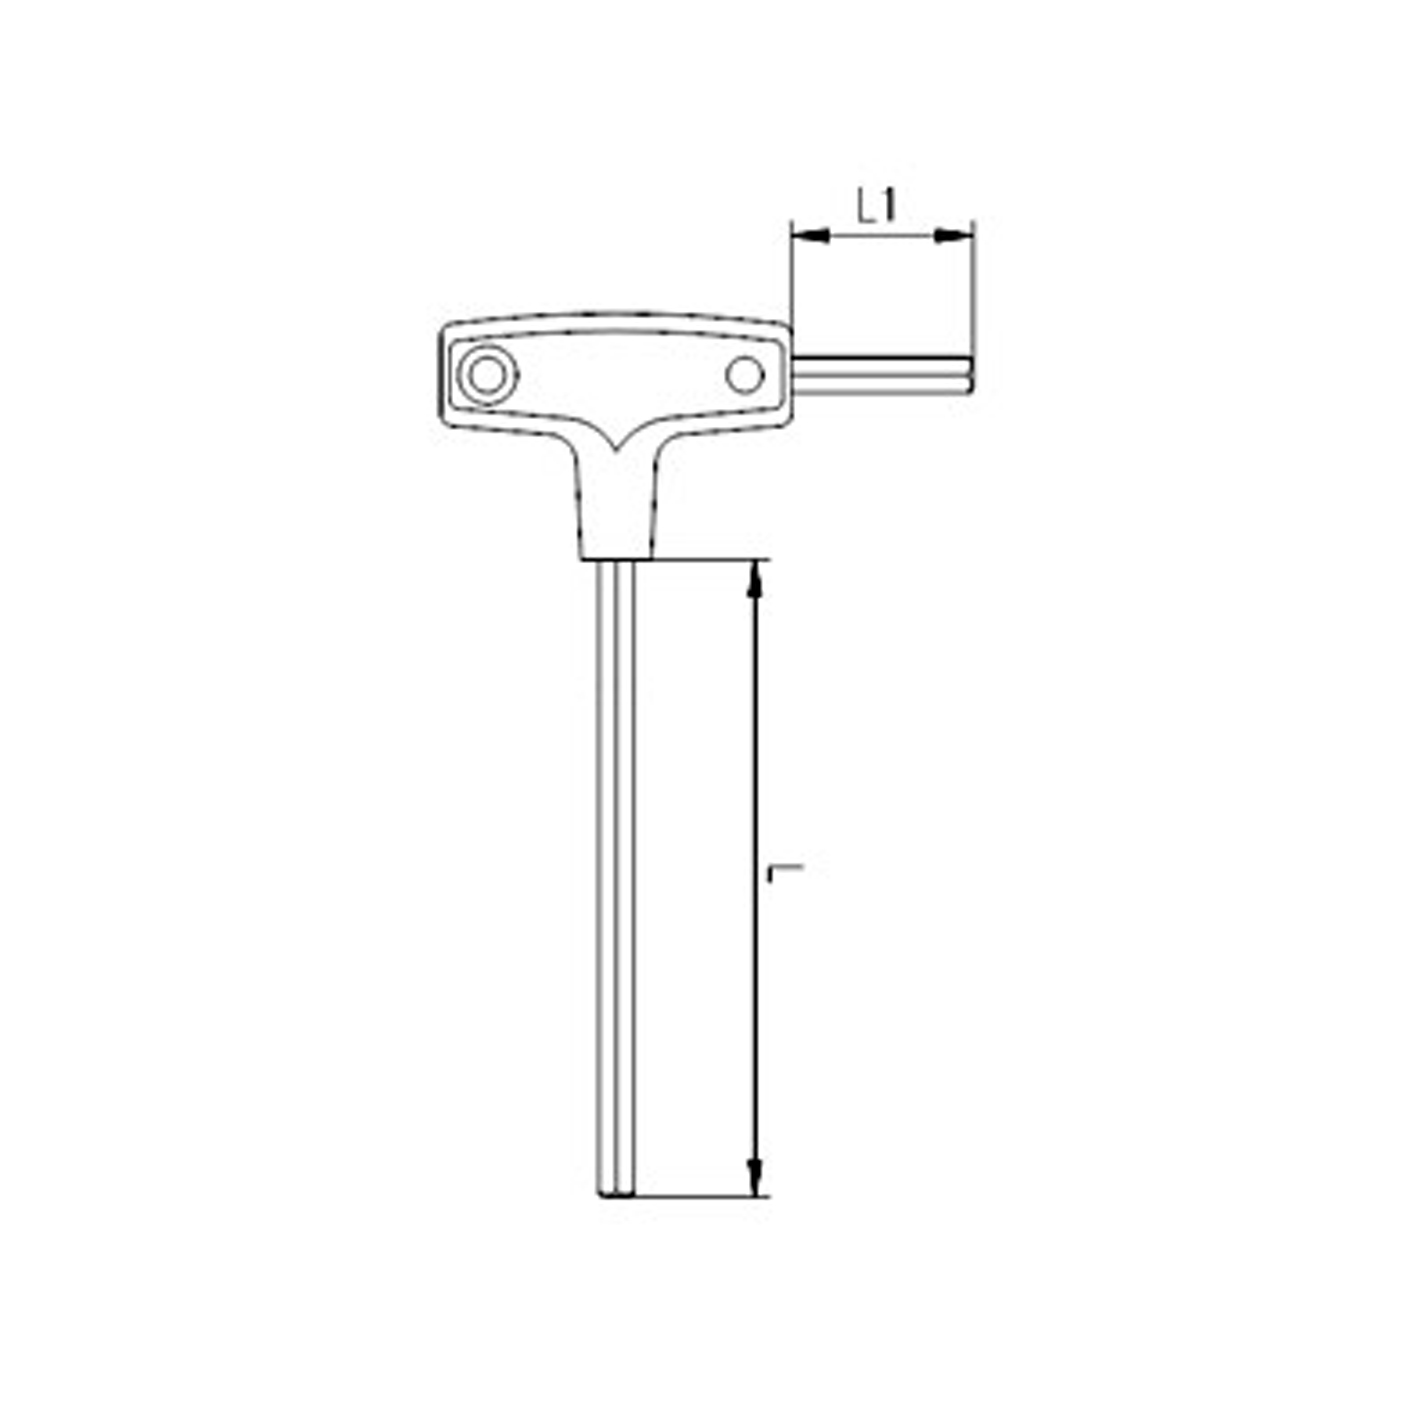 İzeltaş 8mm T Tipi Allen Anahtar